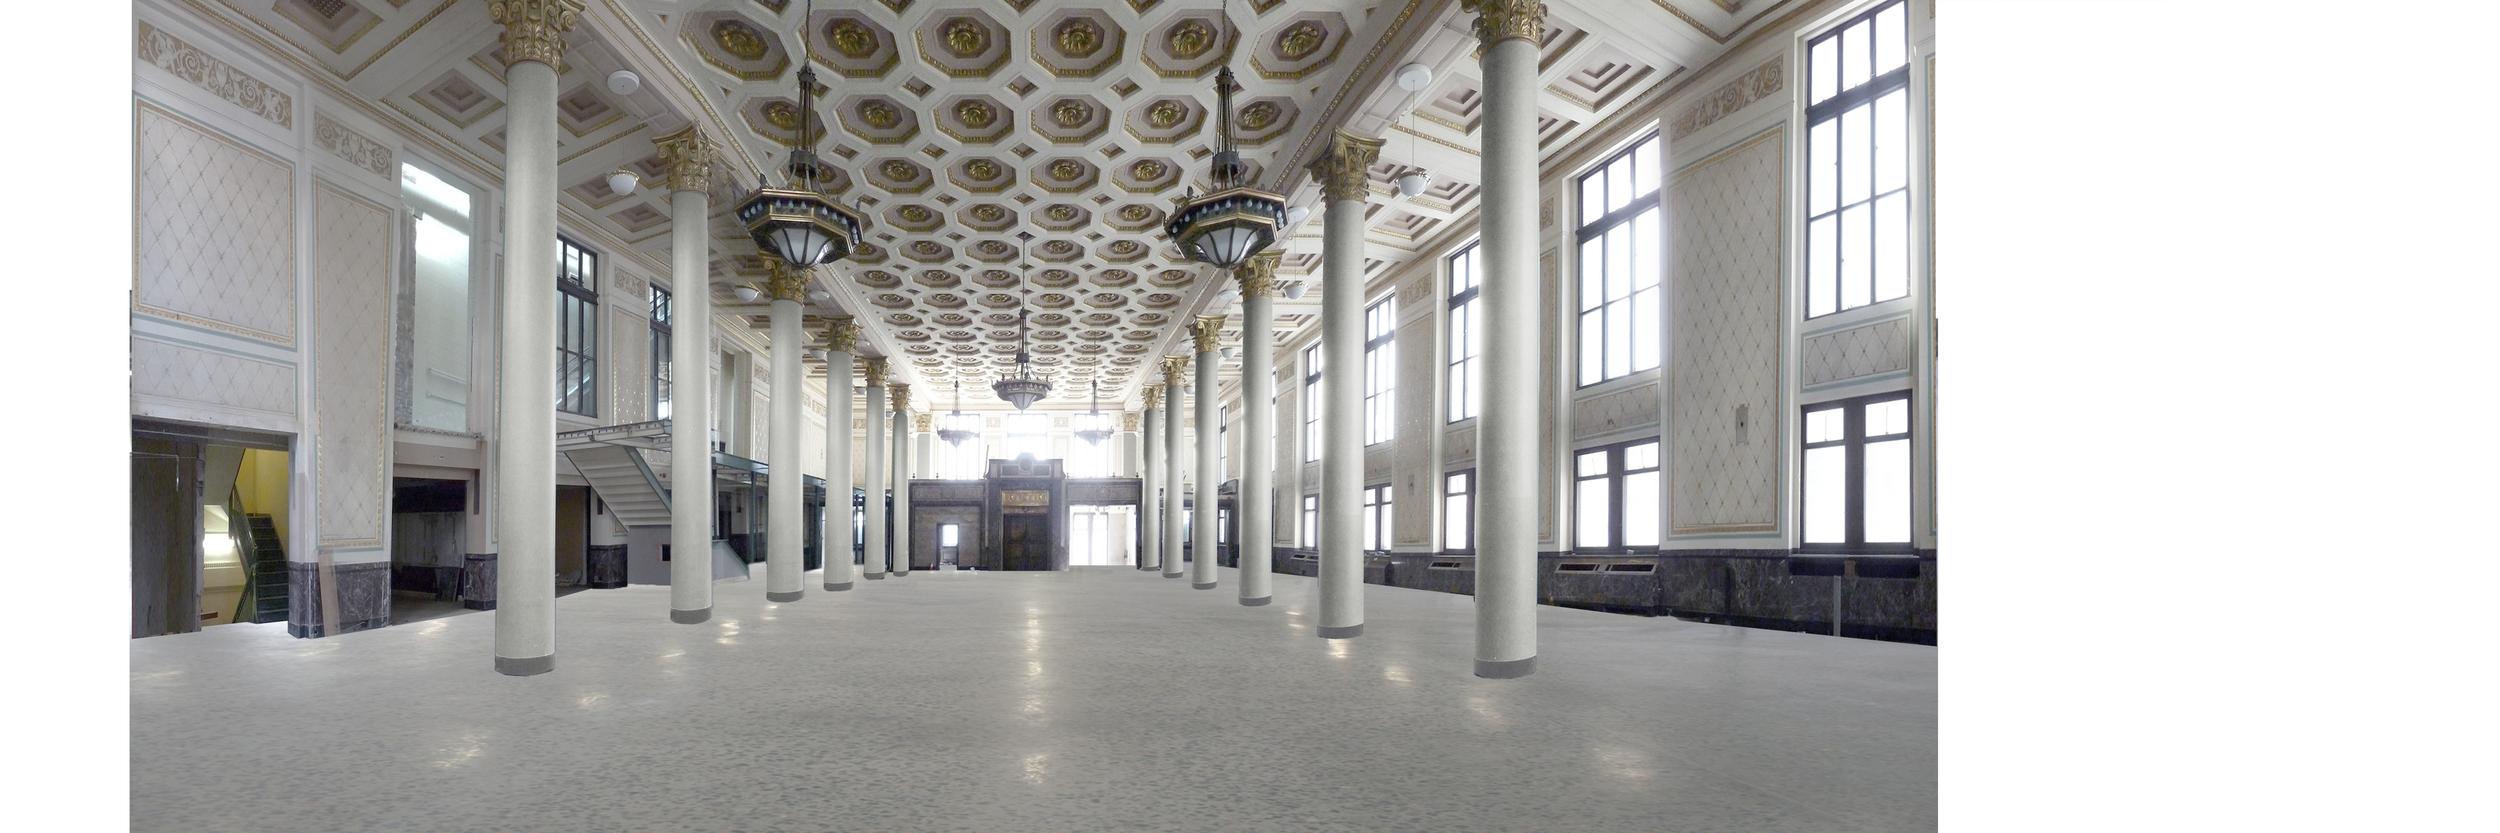 main hall cleaned up.jpg